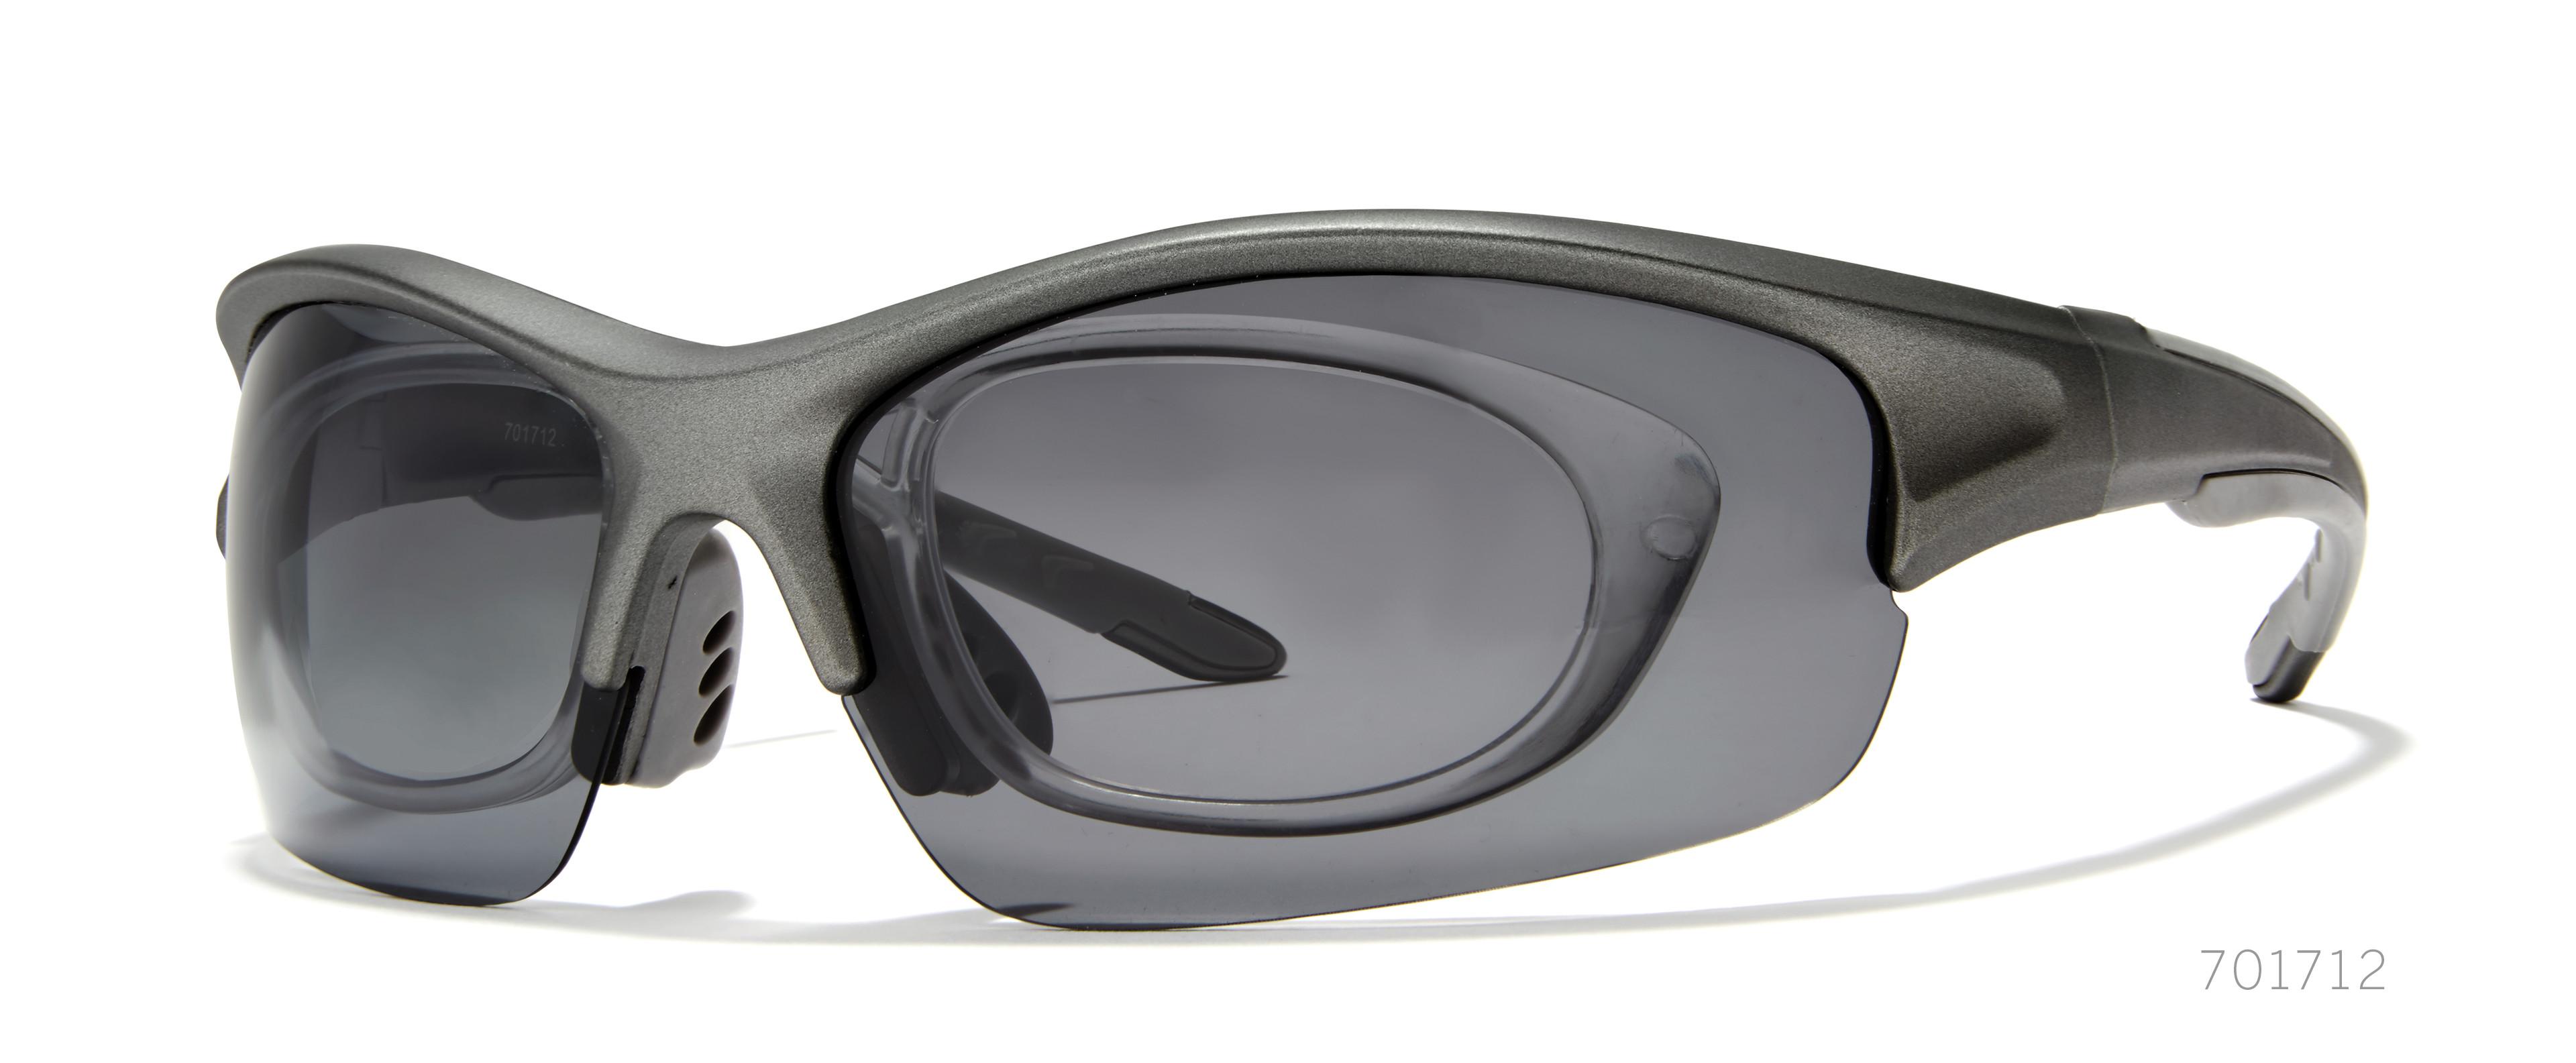 best sunglasses for bike riding